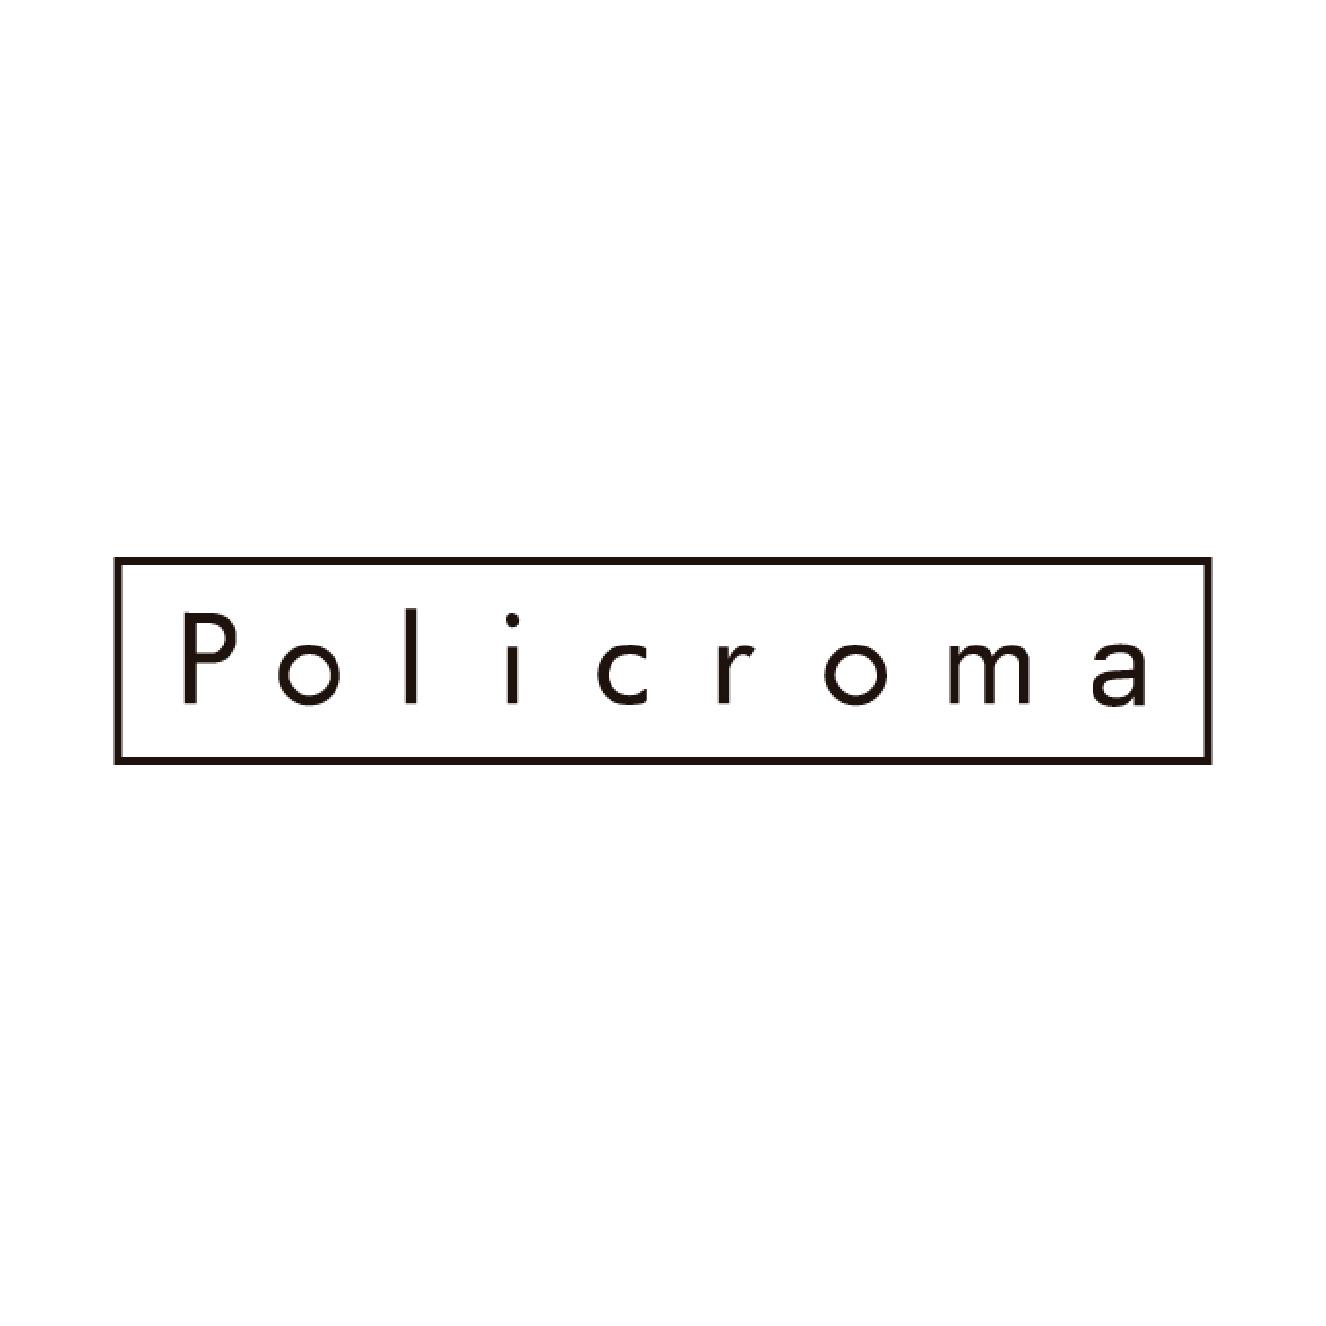 Policroma Gallery